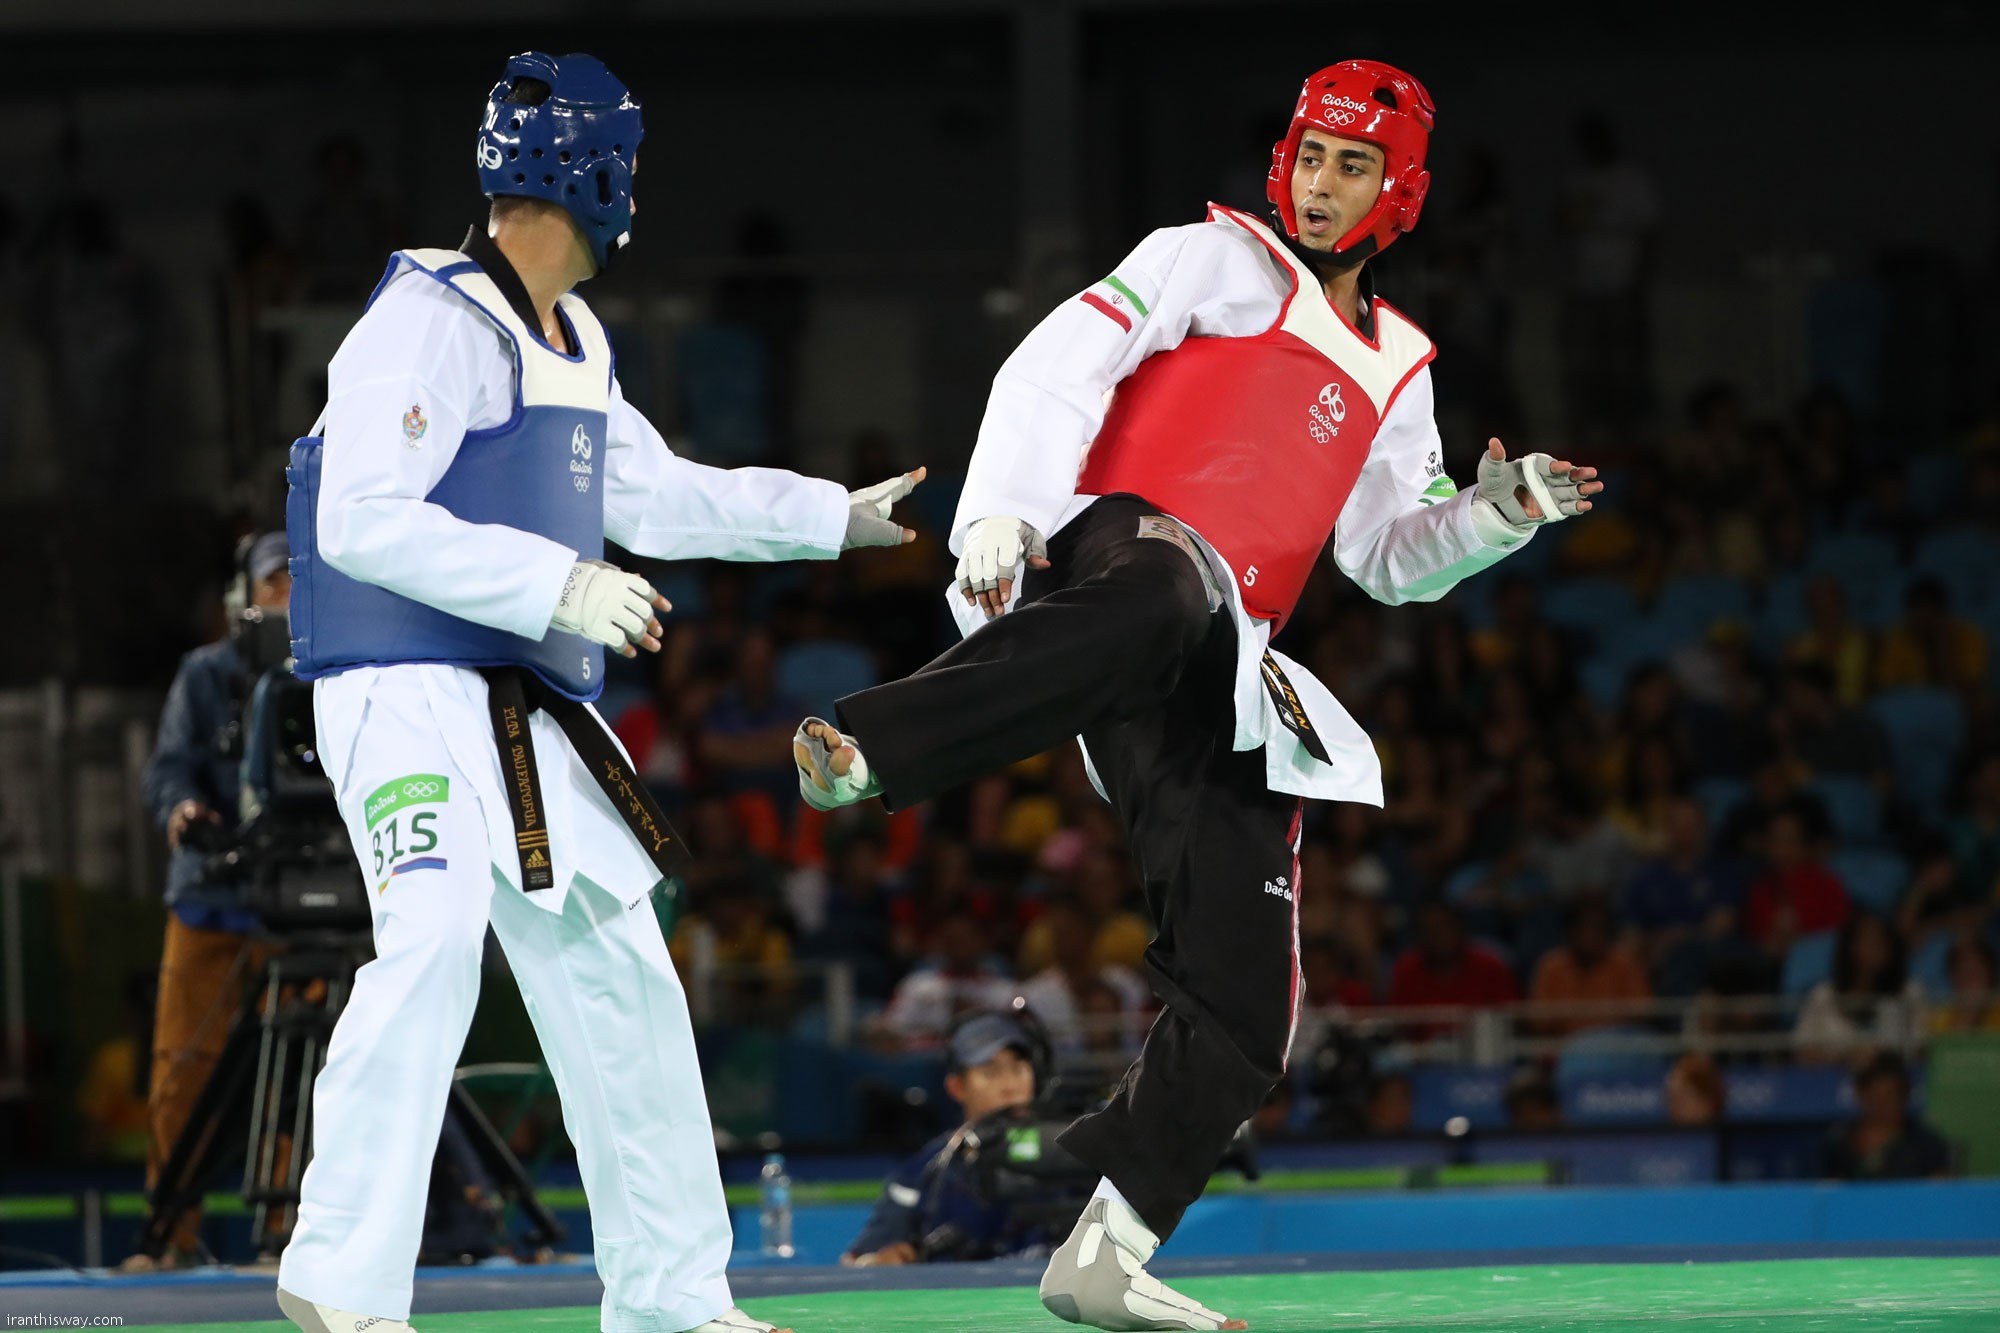 Iran's Mardani fades Rio 2016 Olympics in golden round